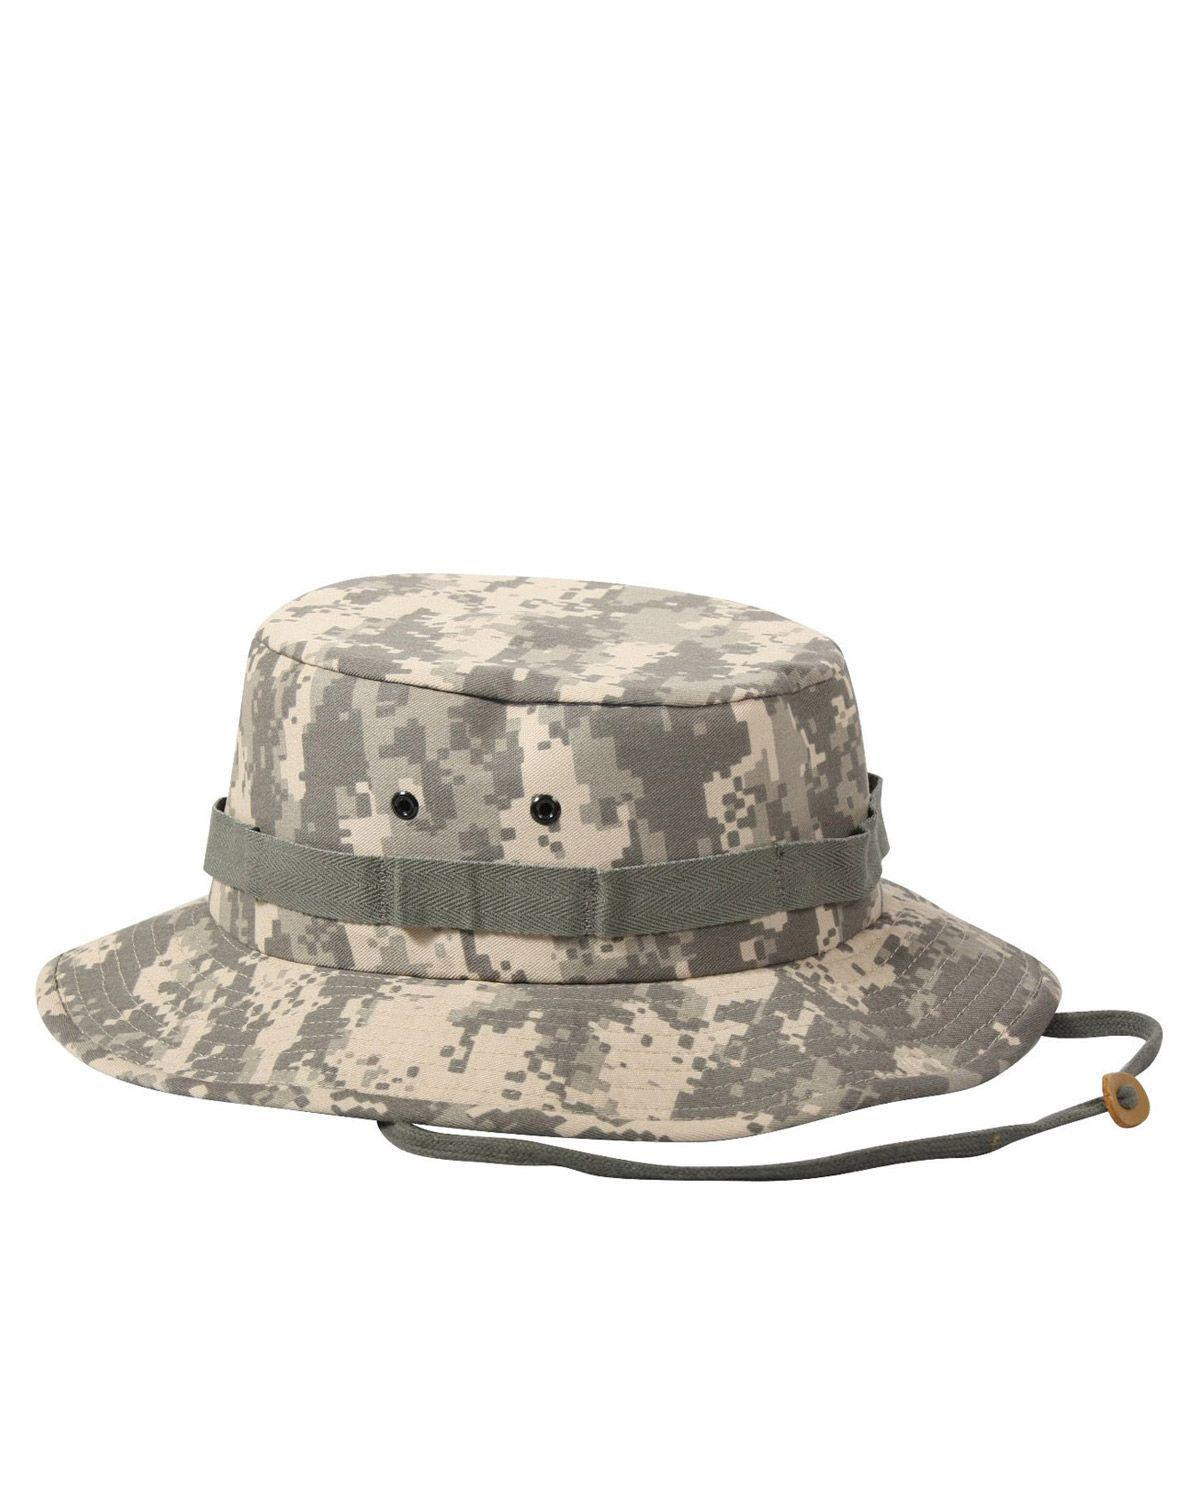 Image of   Rothco Army Boonie (ACU Camo, L / 59cm)